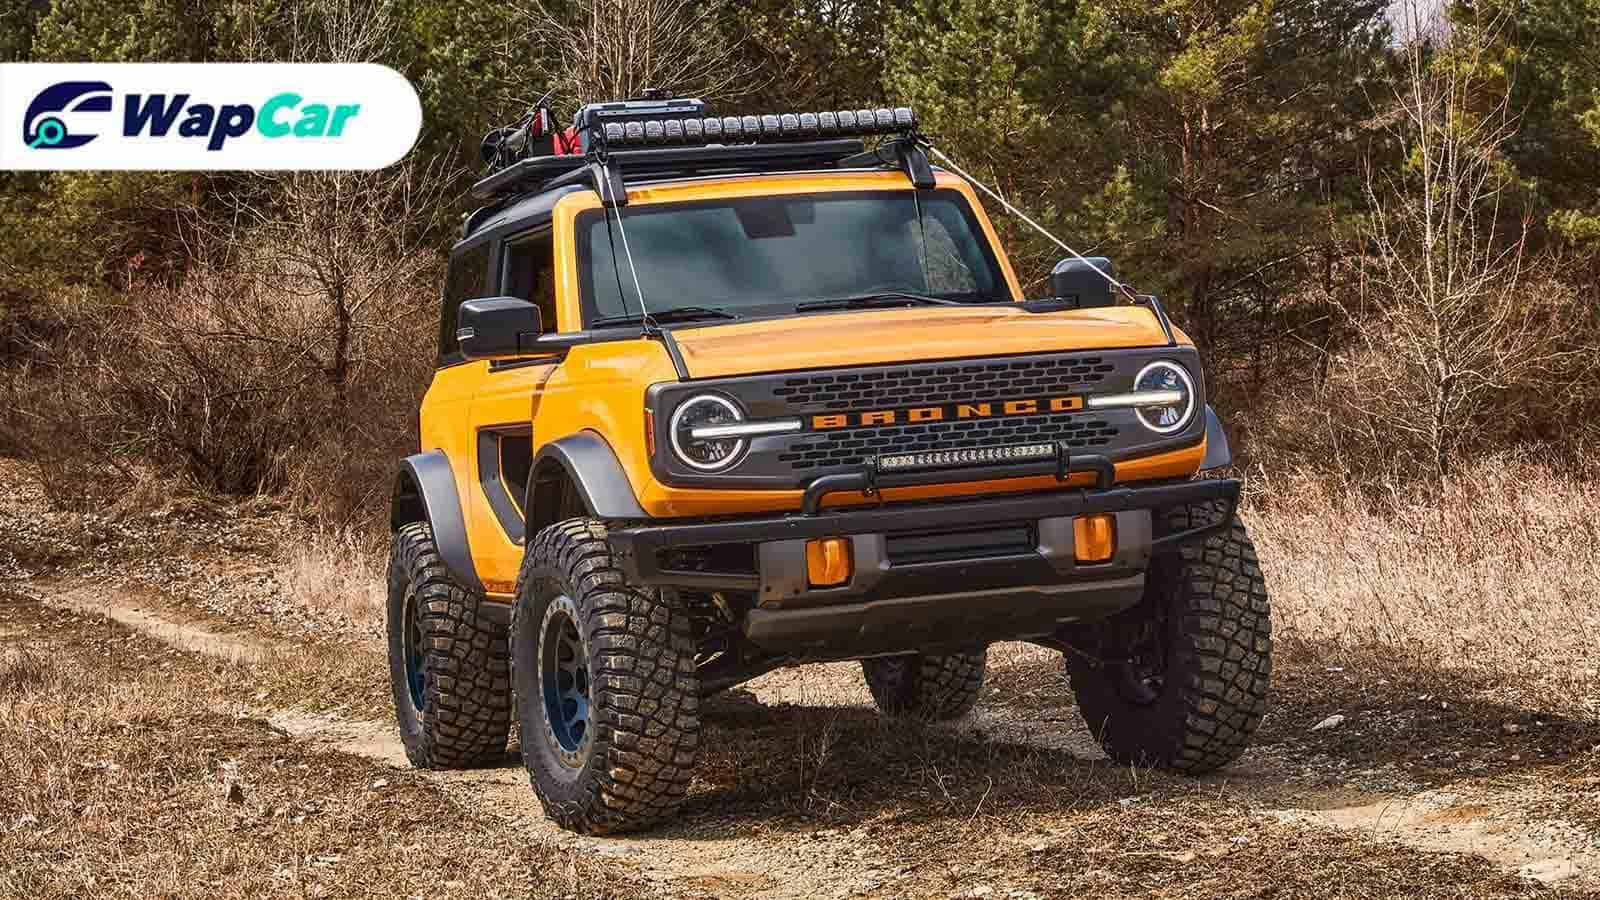 2021 Ford Bronco looks set to wrangle the competition | Wapcar